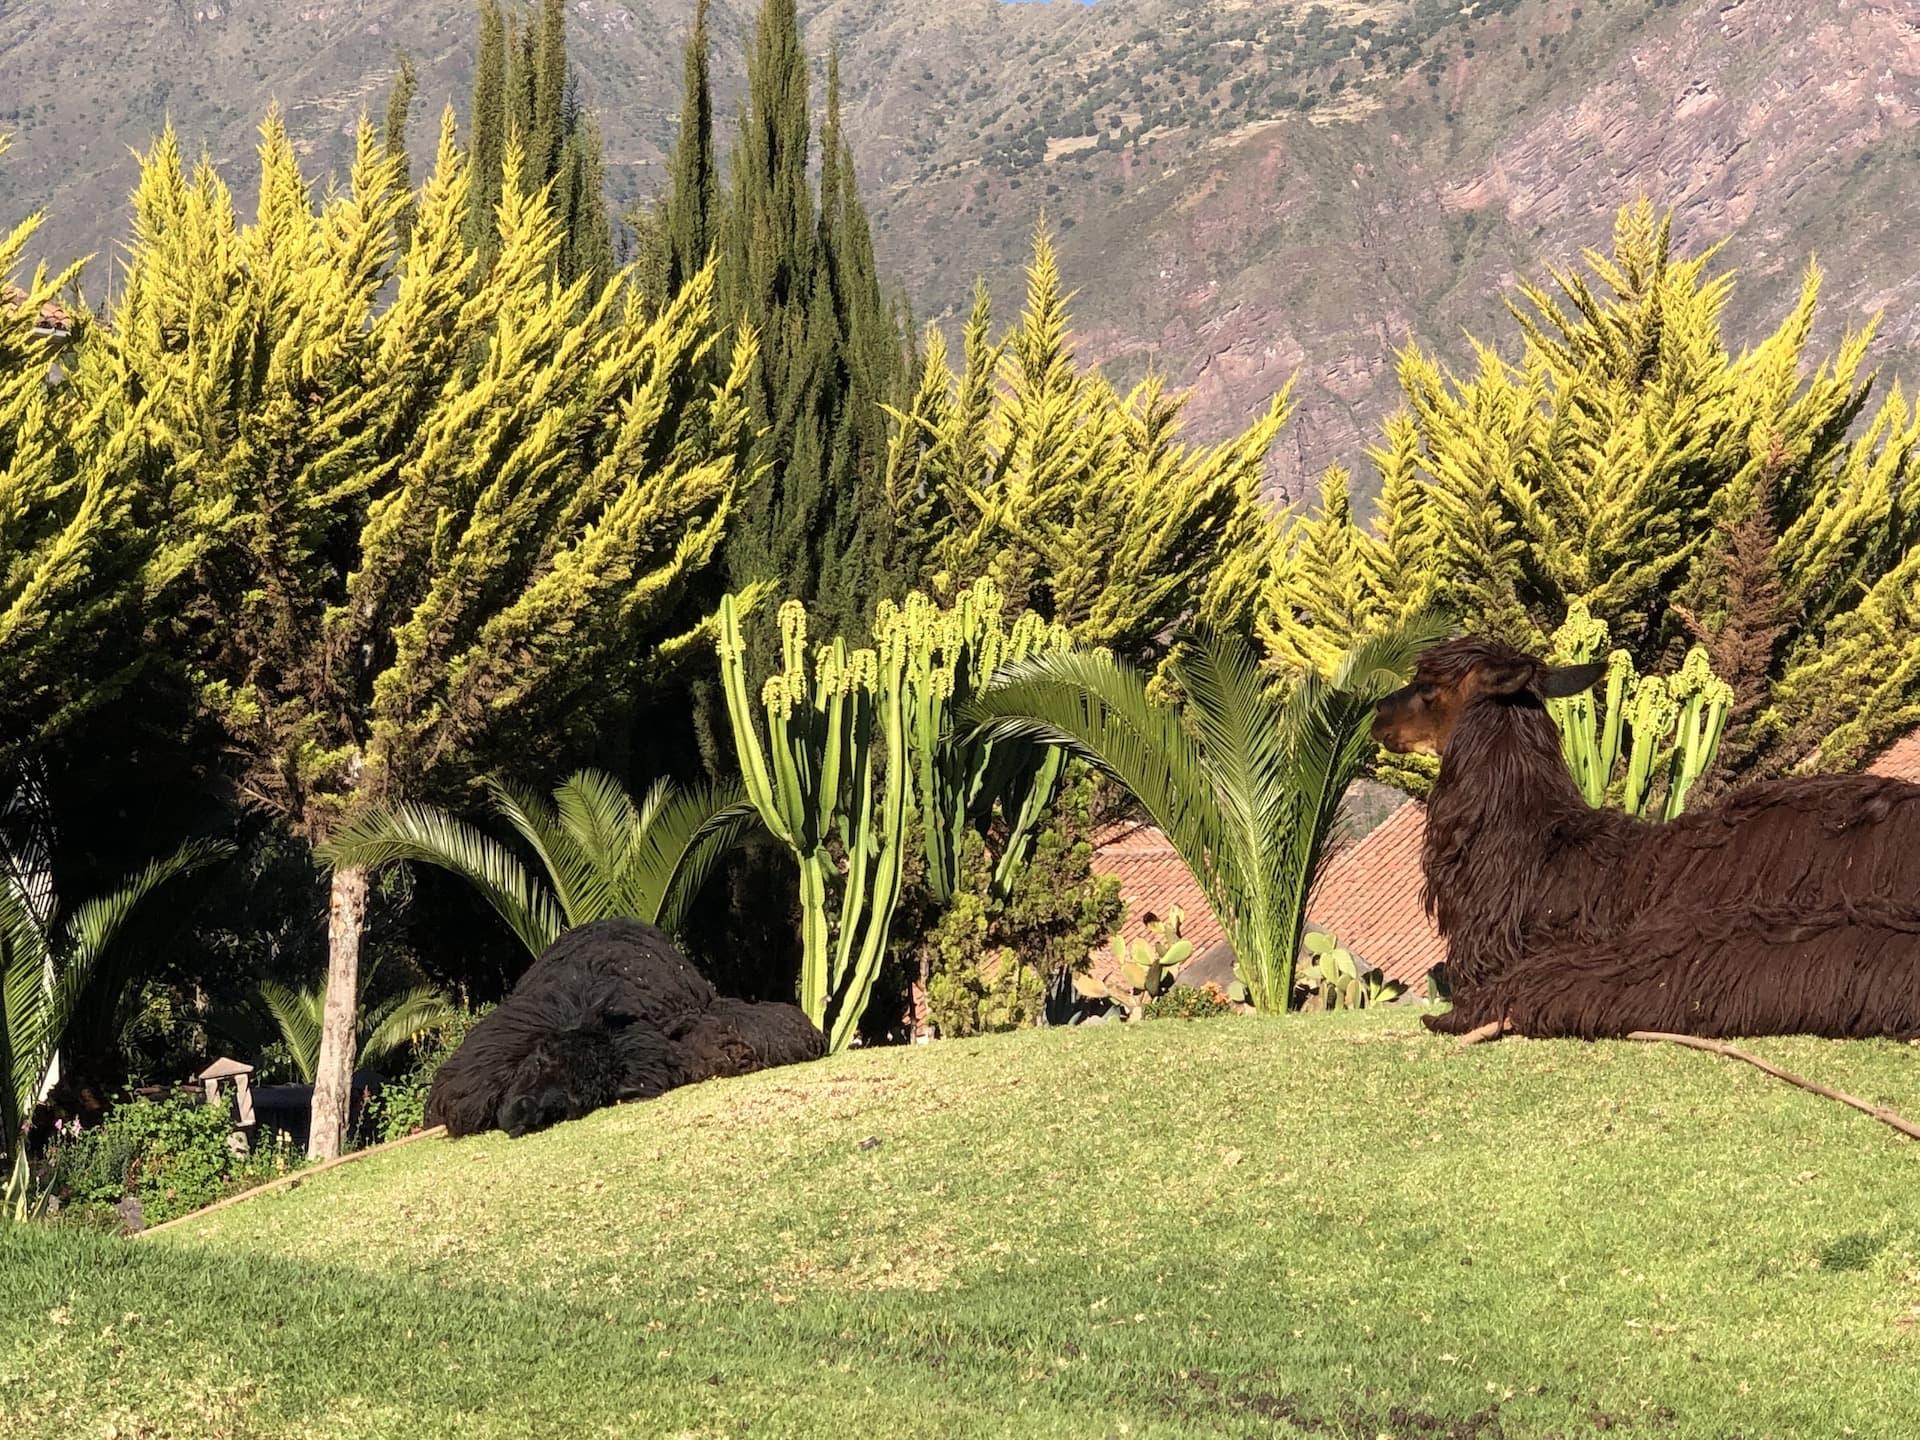 The First Principle Machu Picchu Post Expedition 22.jpg